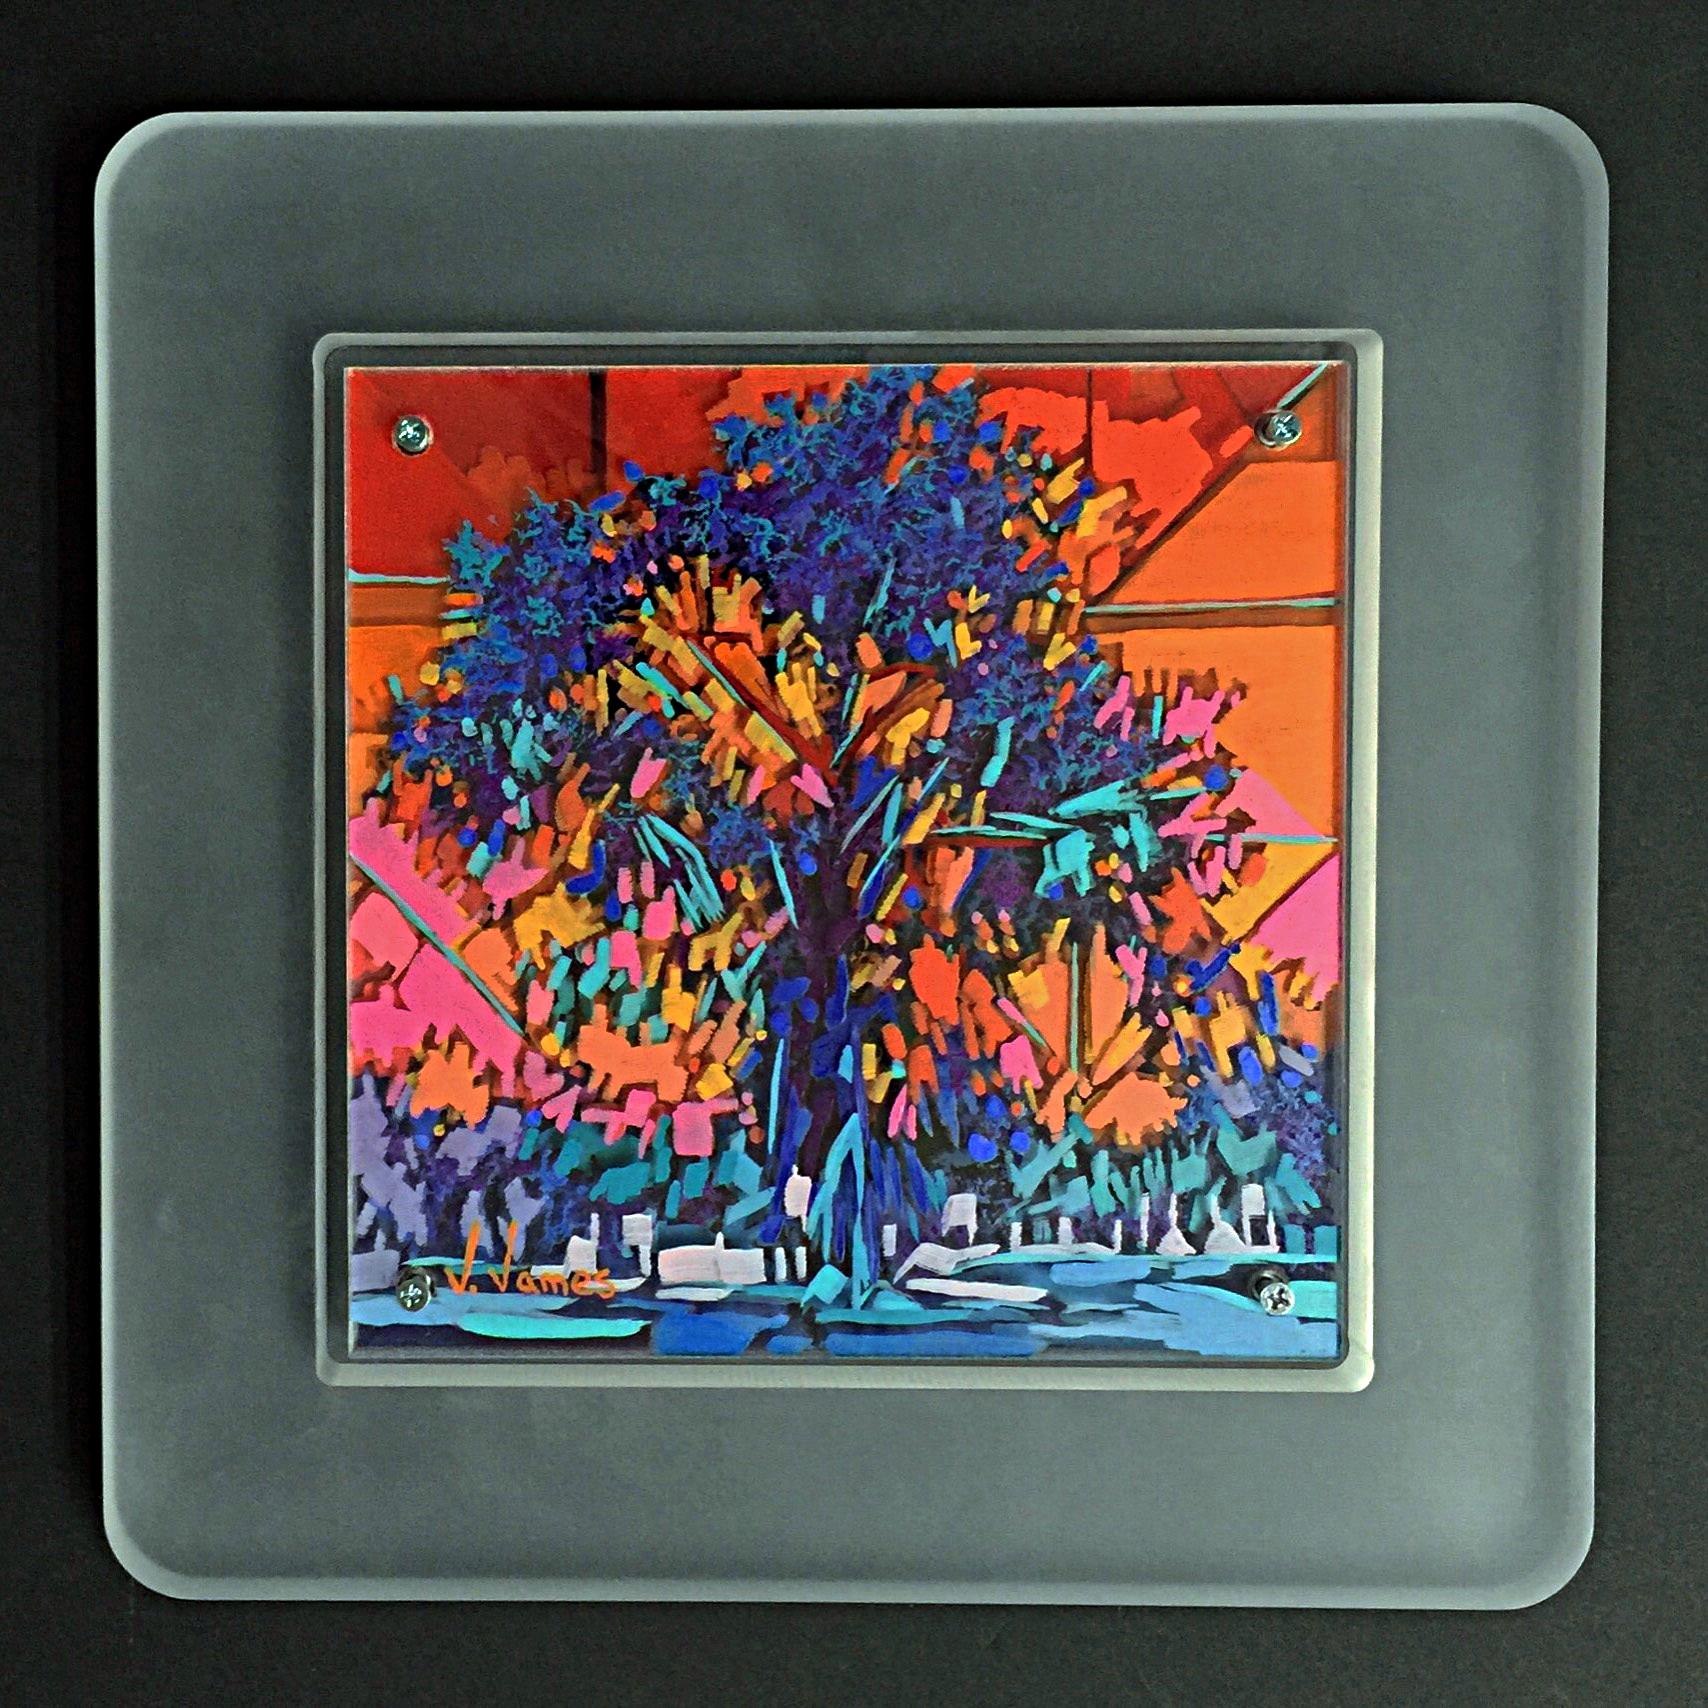 "Tangerine Sky, 8"" x 8"" Acrylic on Multi-Layered Acrylic Glass"